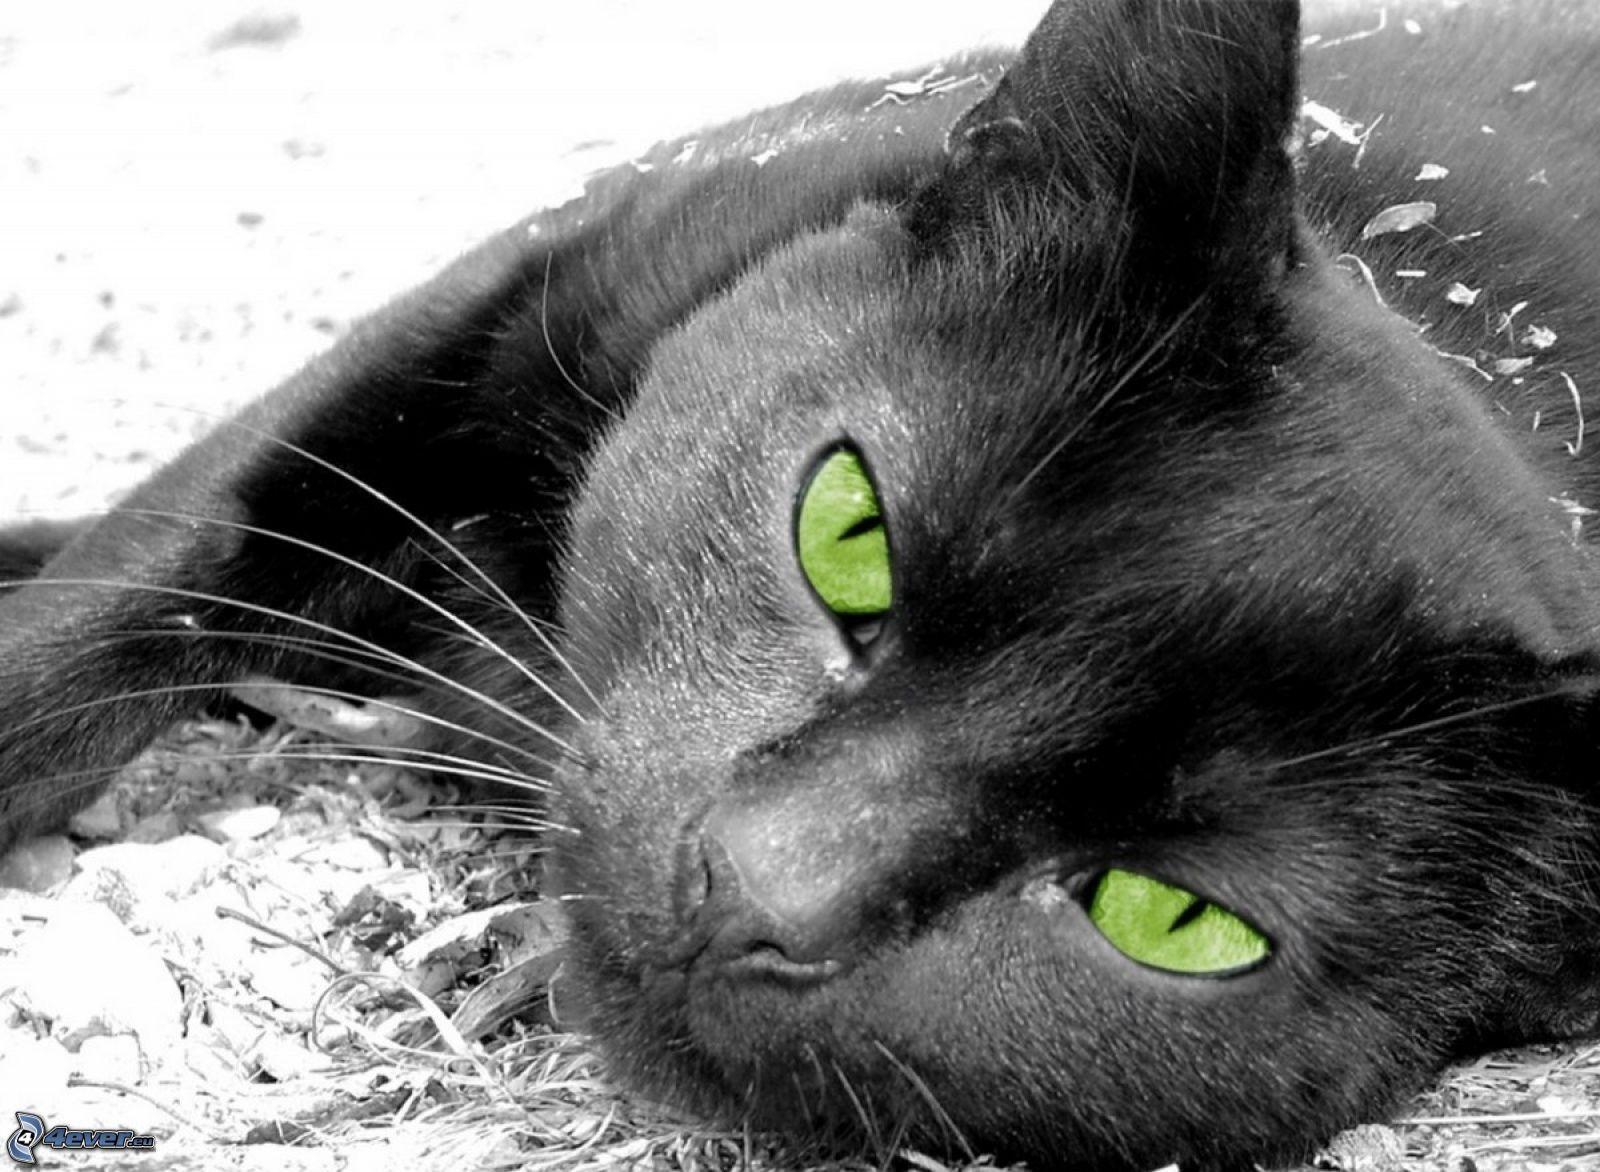 chats aux yeux verts. Black Bedroom Furniture Sets. Home Design Ideas